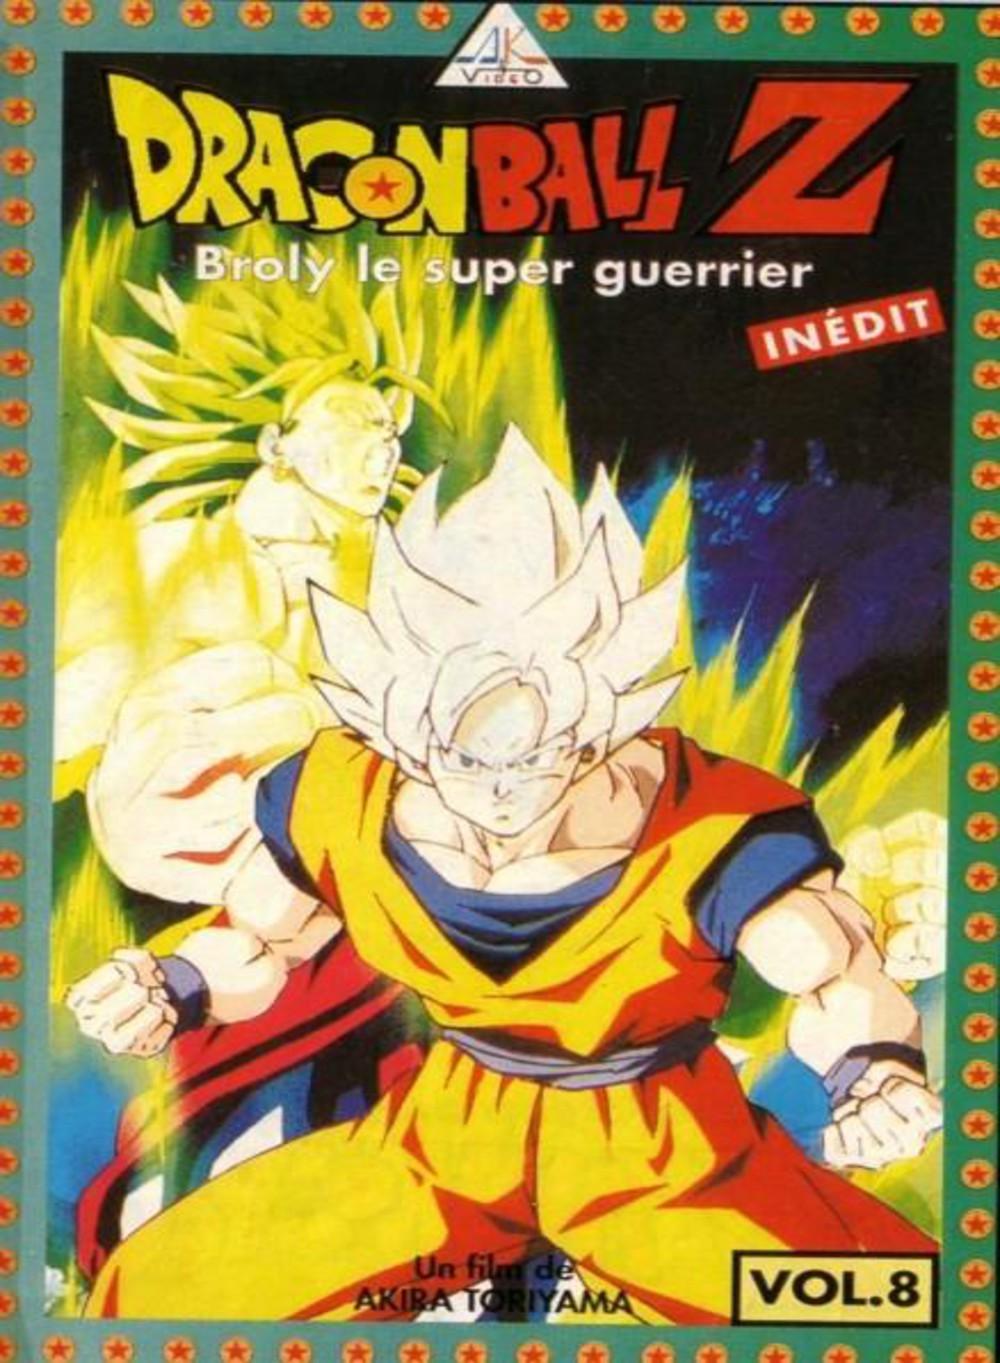 Dragon Ball Z - Film 8 - Broly, le super guerrier